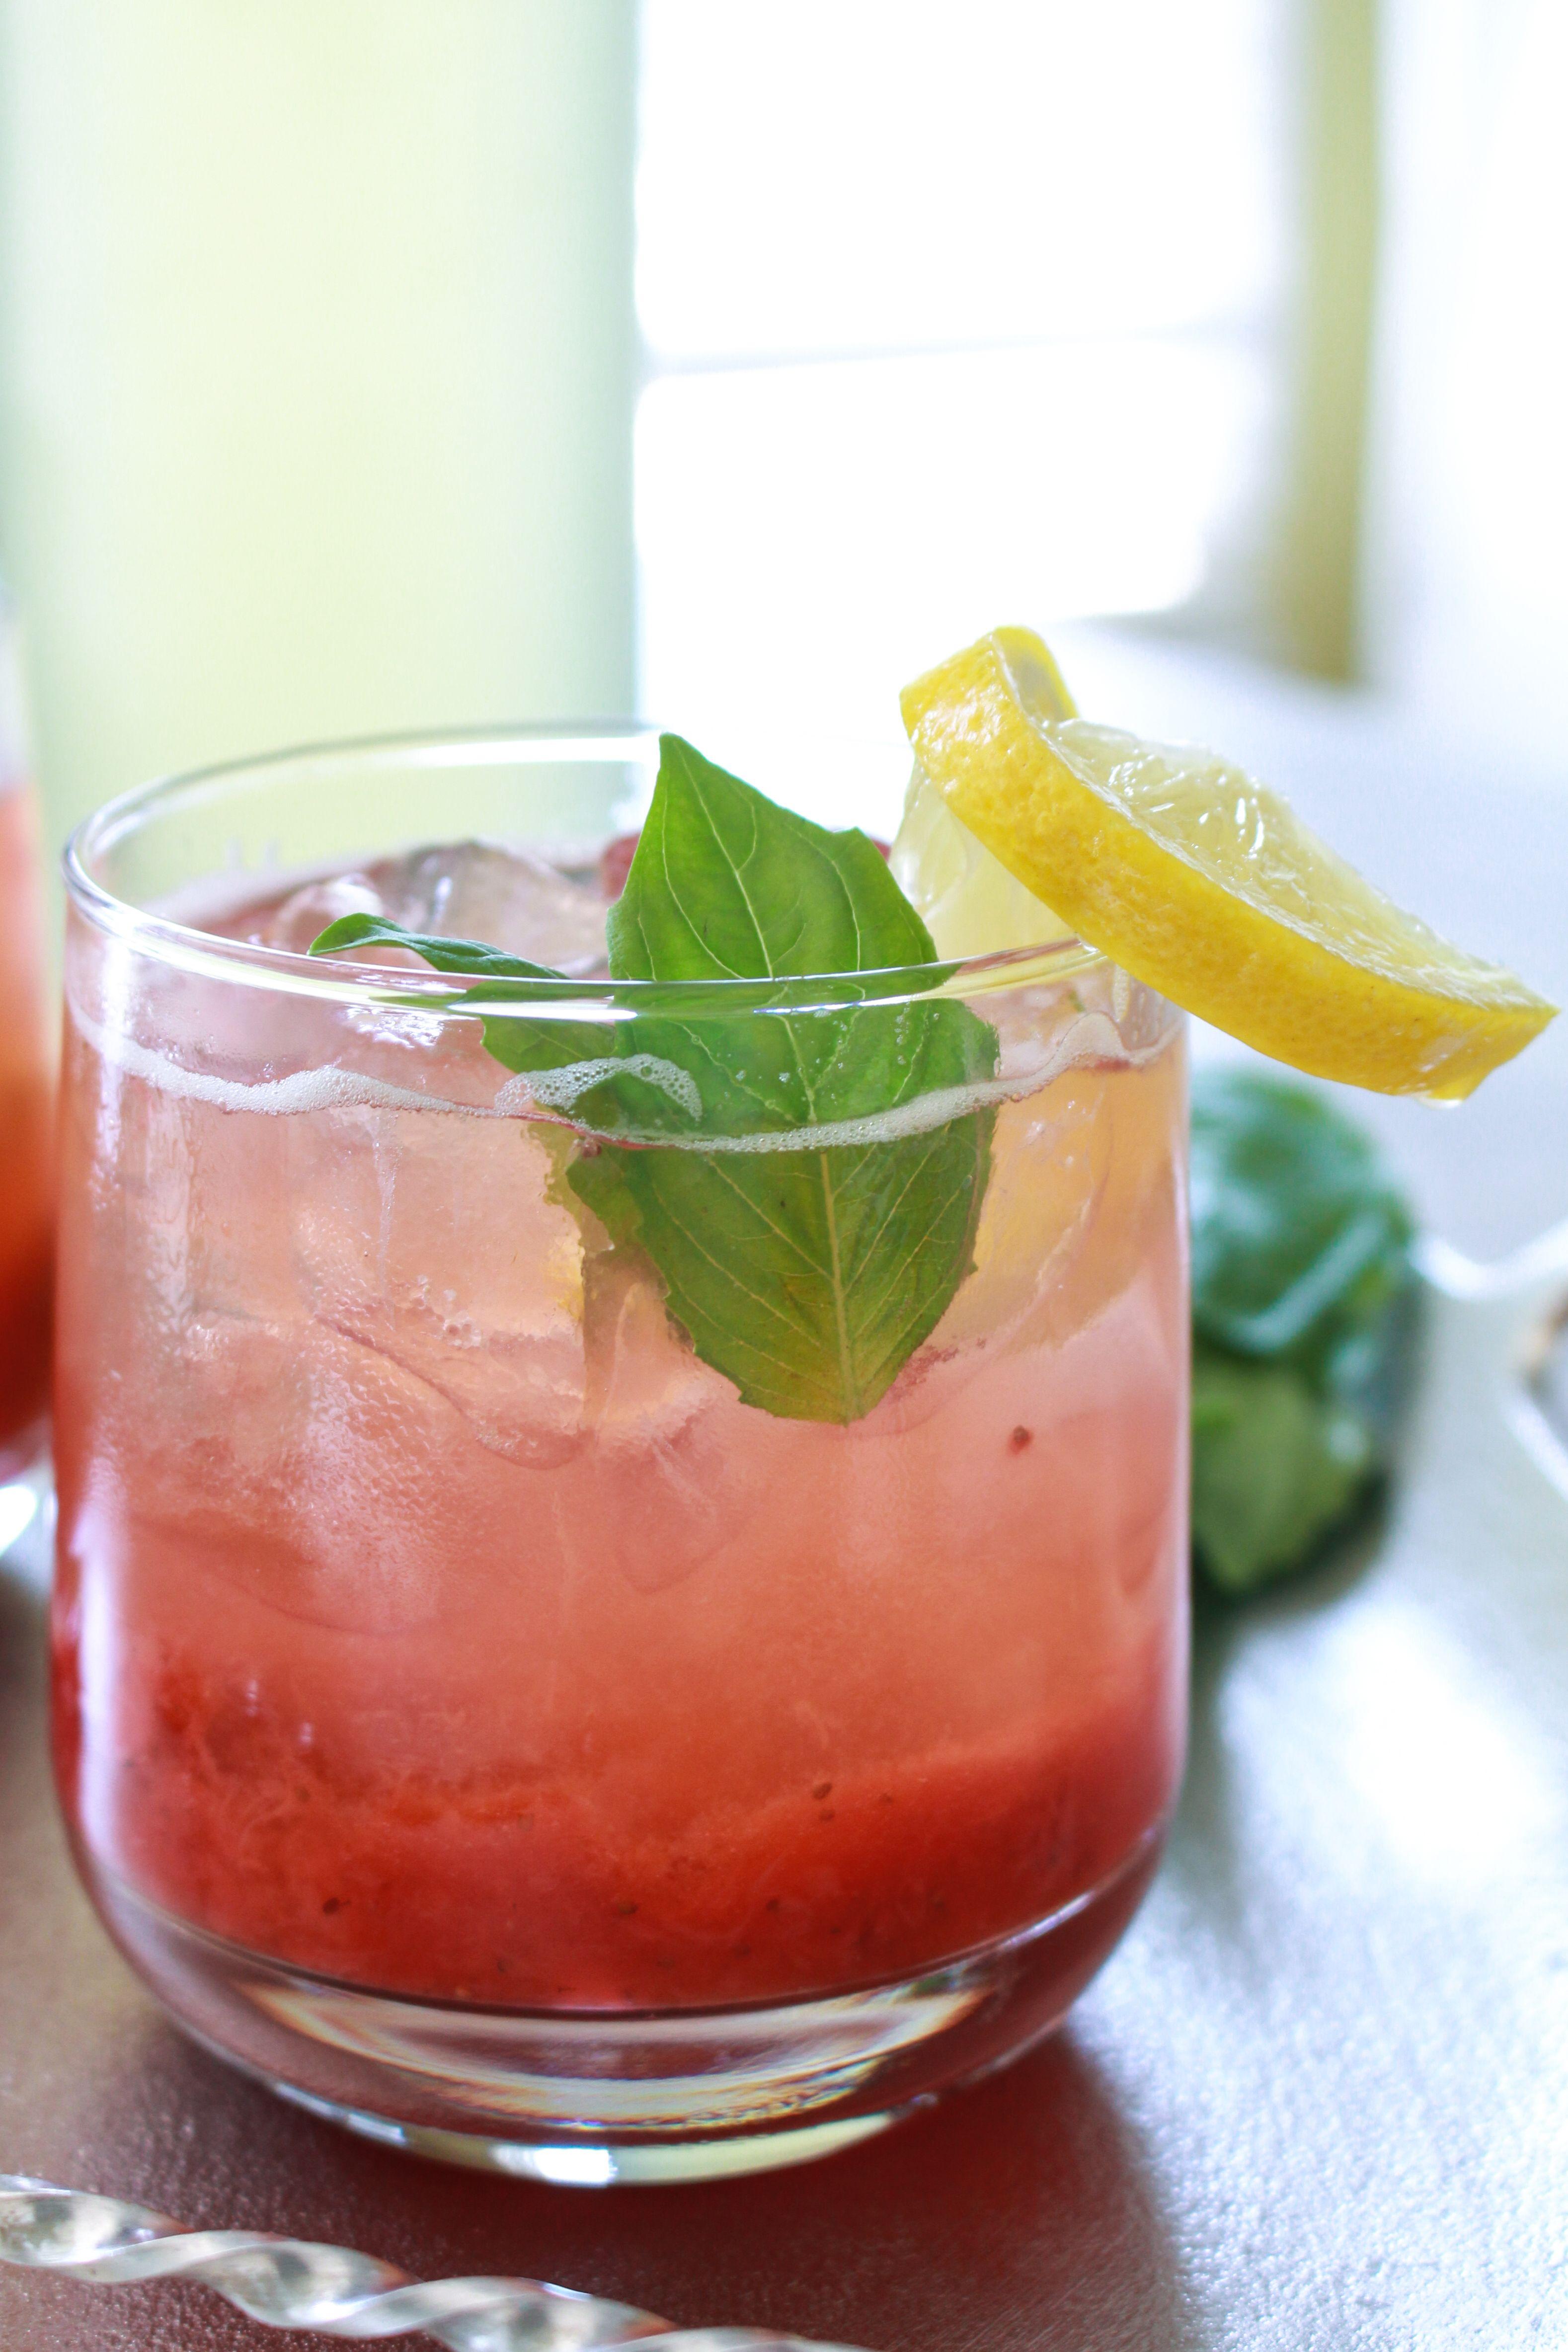 Strawberry Basil Lemonade from The Ruby Kitchen